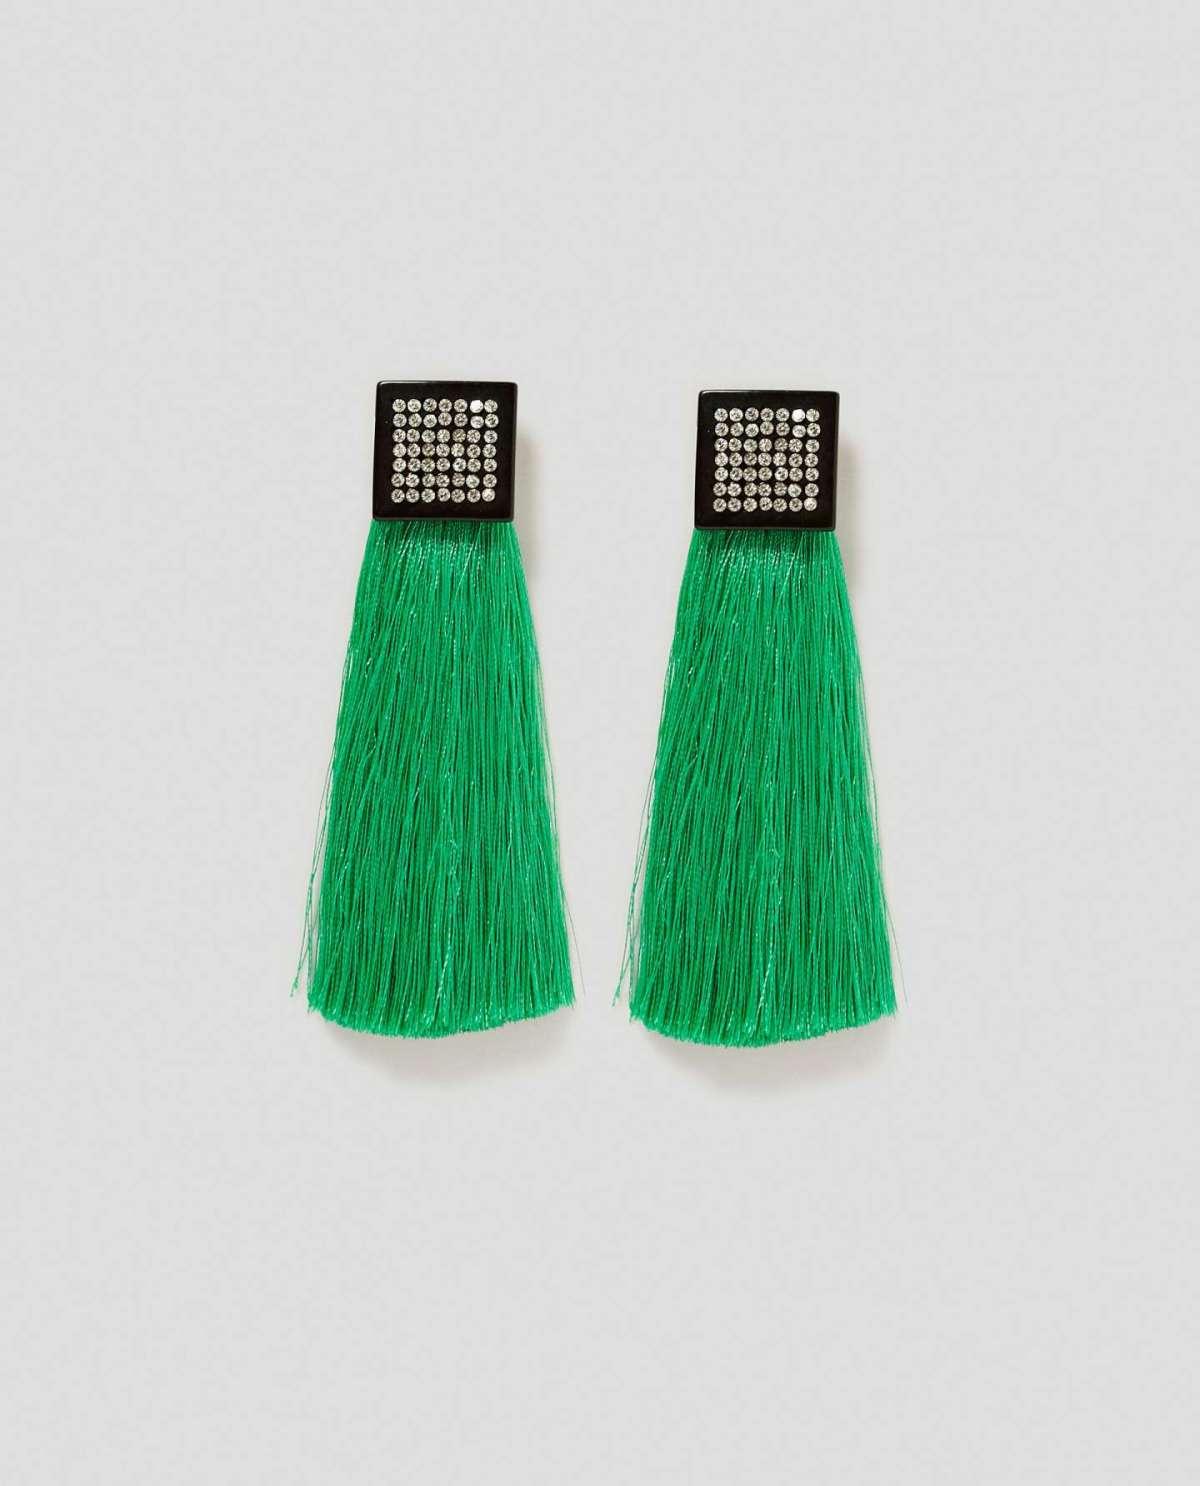 Orecchini con frange verdi